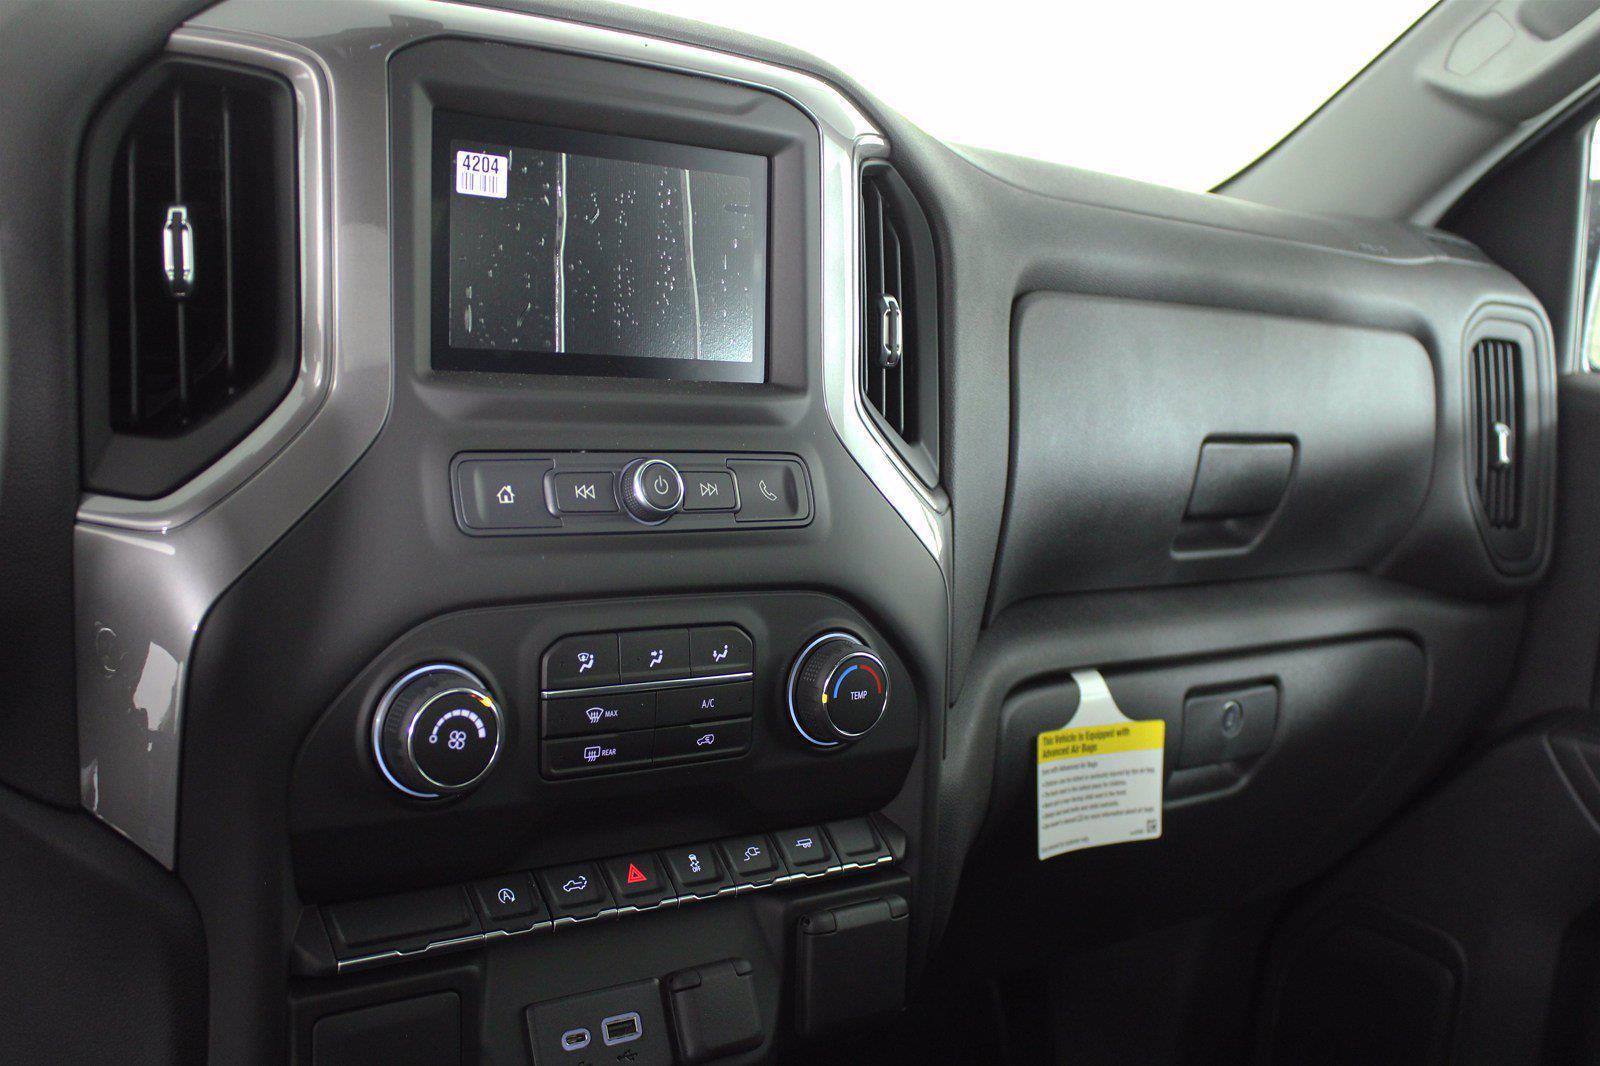 2021 Chevrolet Silverado 1500 Regular Cab 4x2, Pickup #D111066 - photo 12